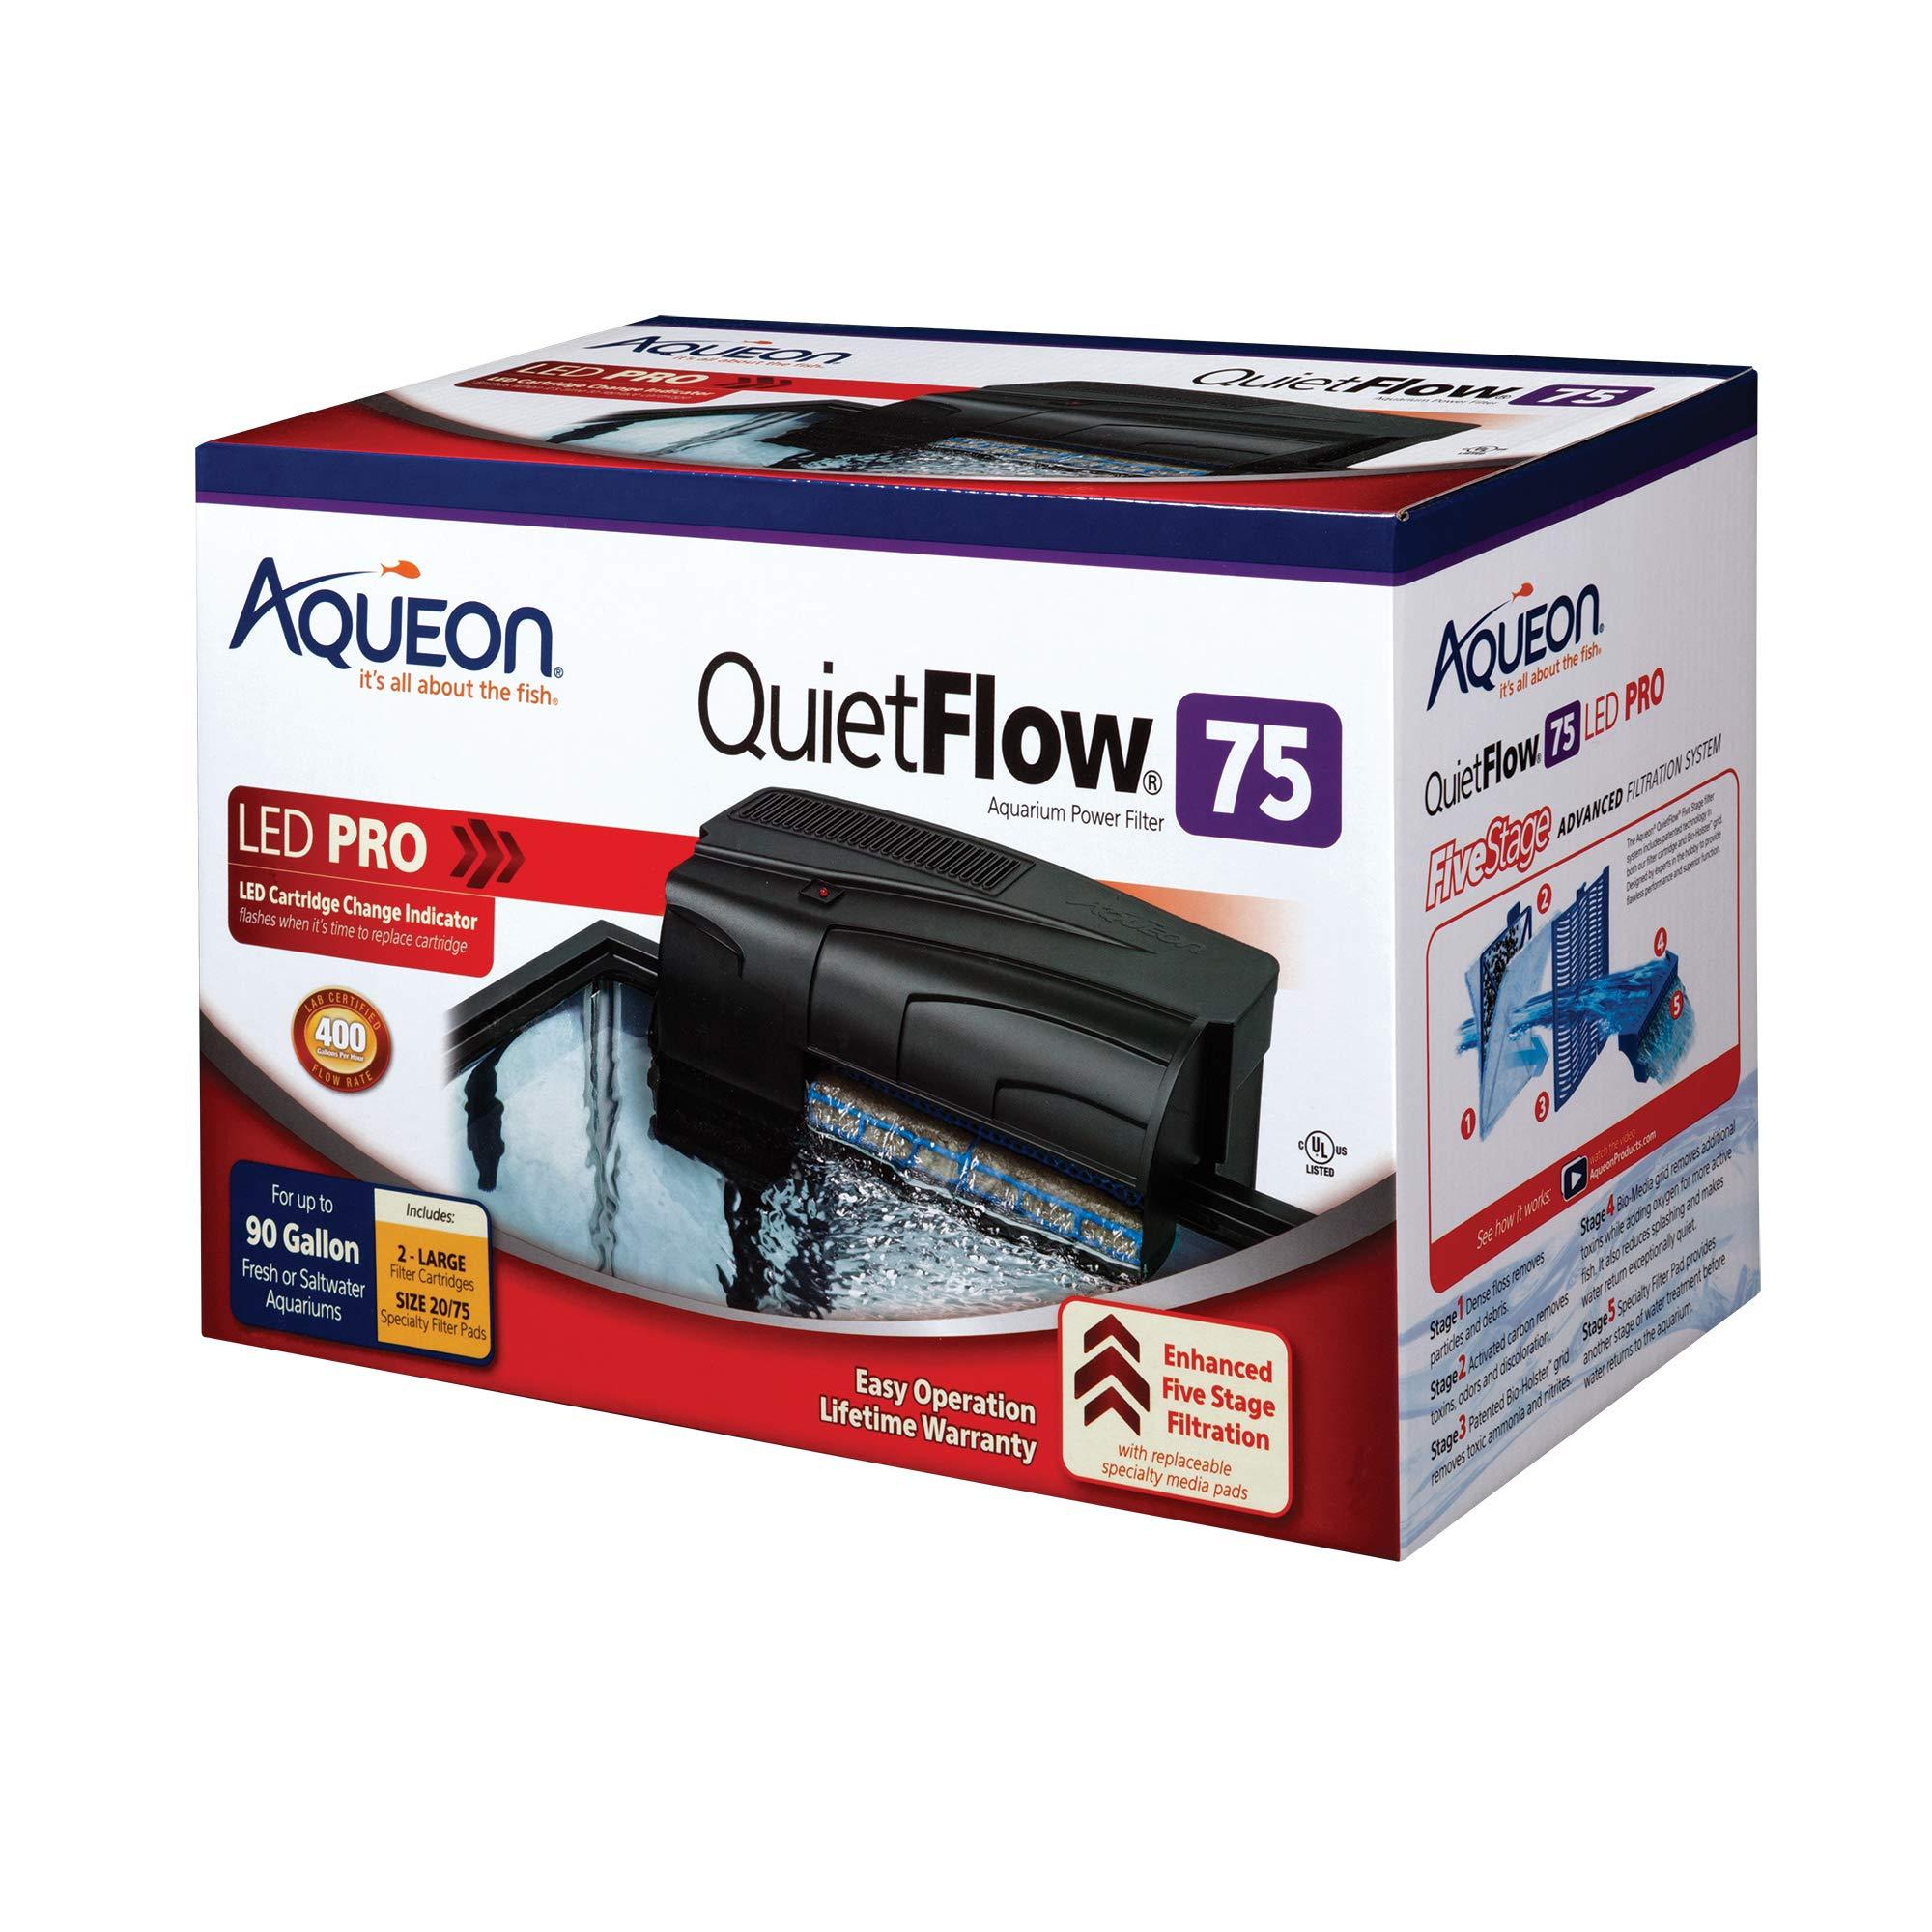 Aqueon QuietFlow LED PRO Aquarium Power Filters, Size 75-400GPH by Aqueon (Image #2)